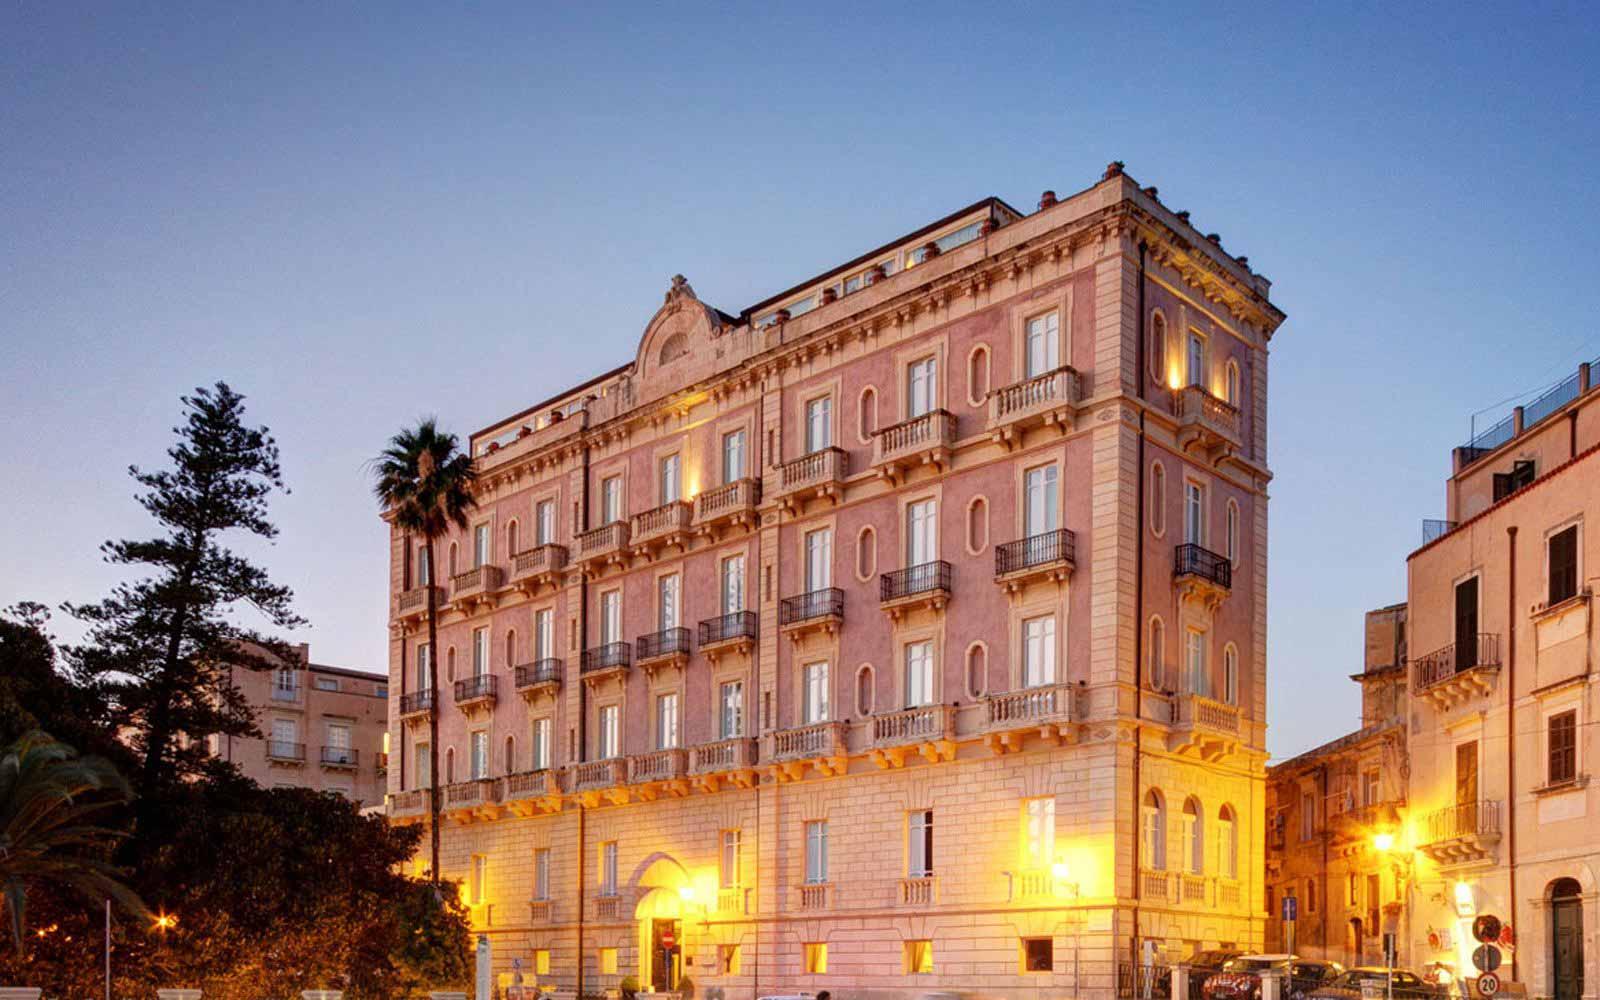 Front of Des Etrangers Hotel & Spa